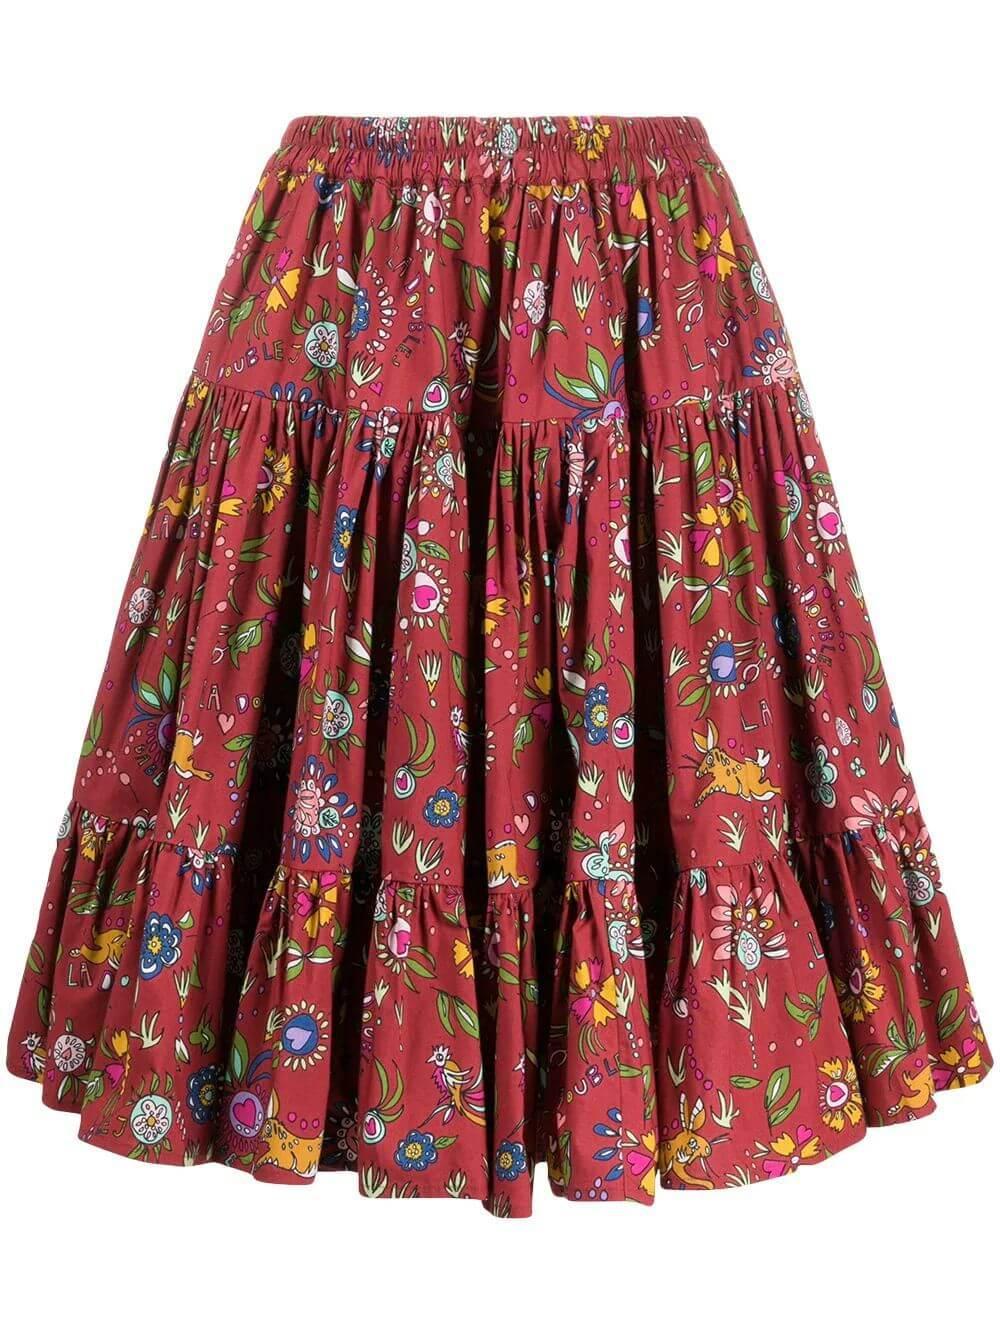 Mini Pleated Love Skirt Item # SKI0038-COT001